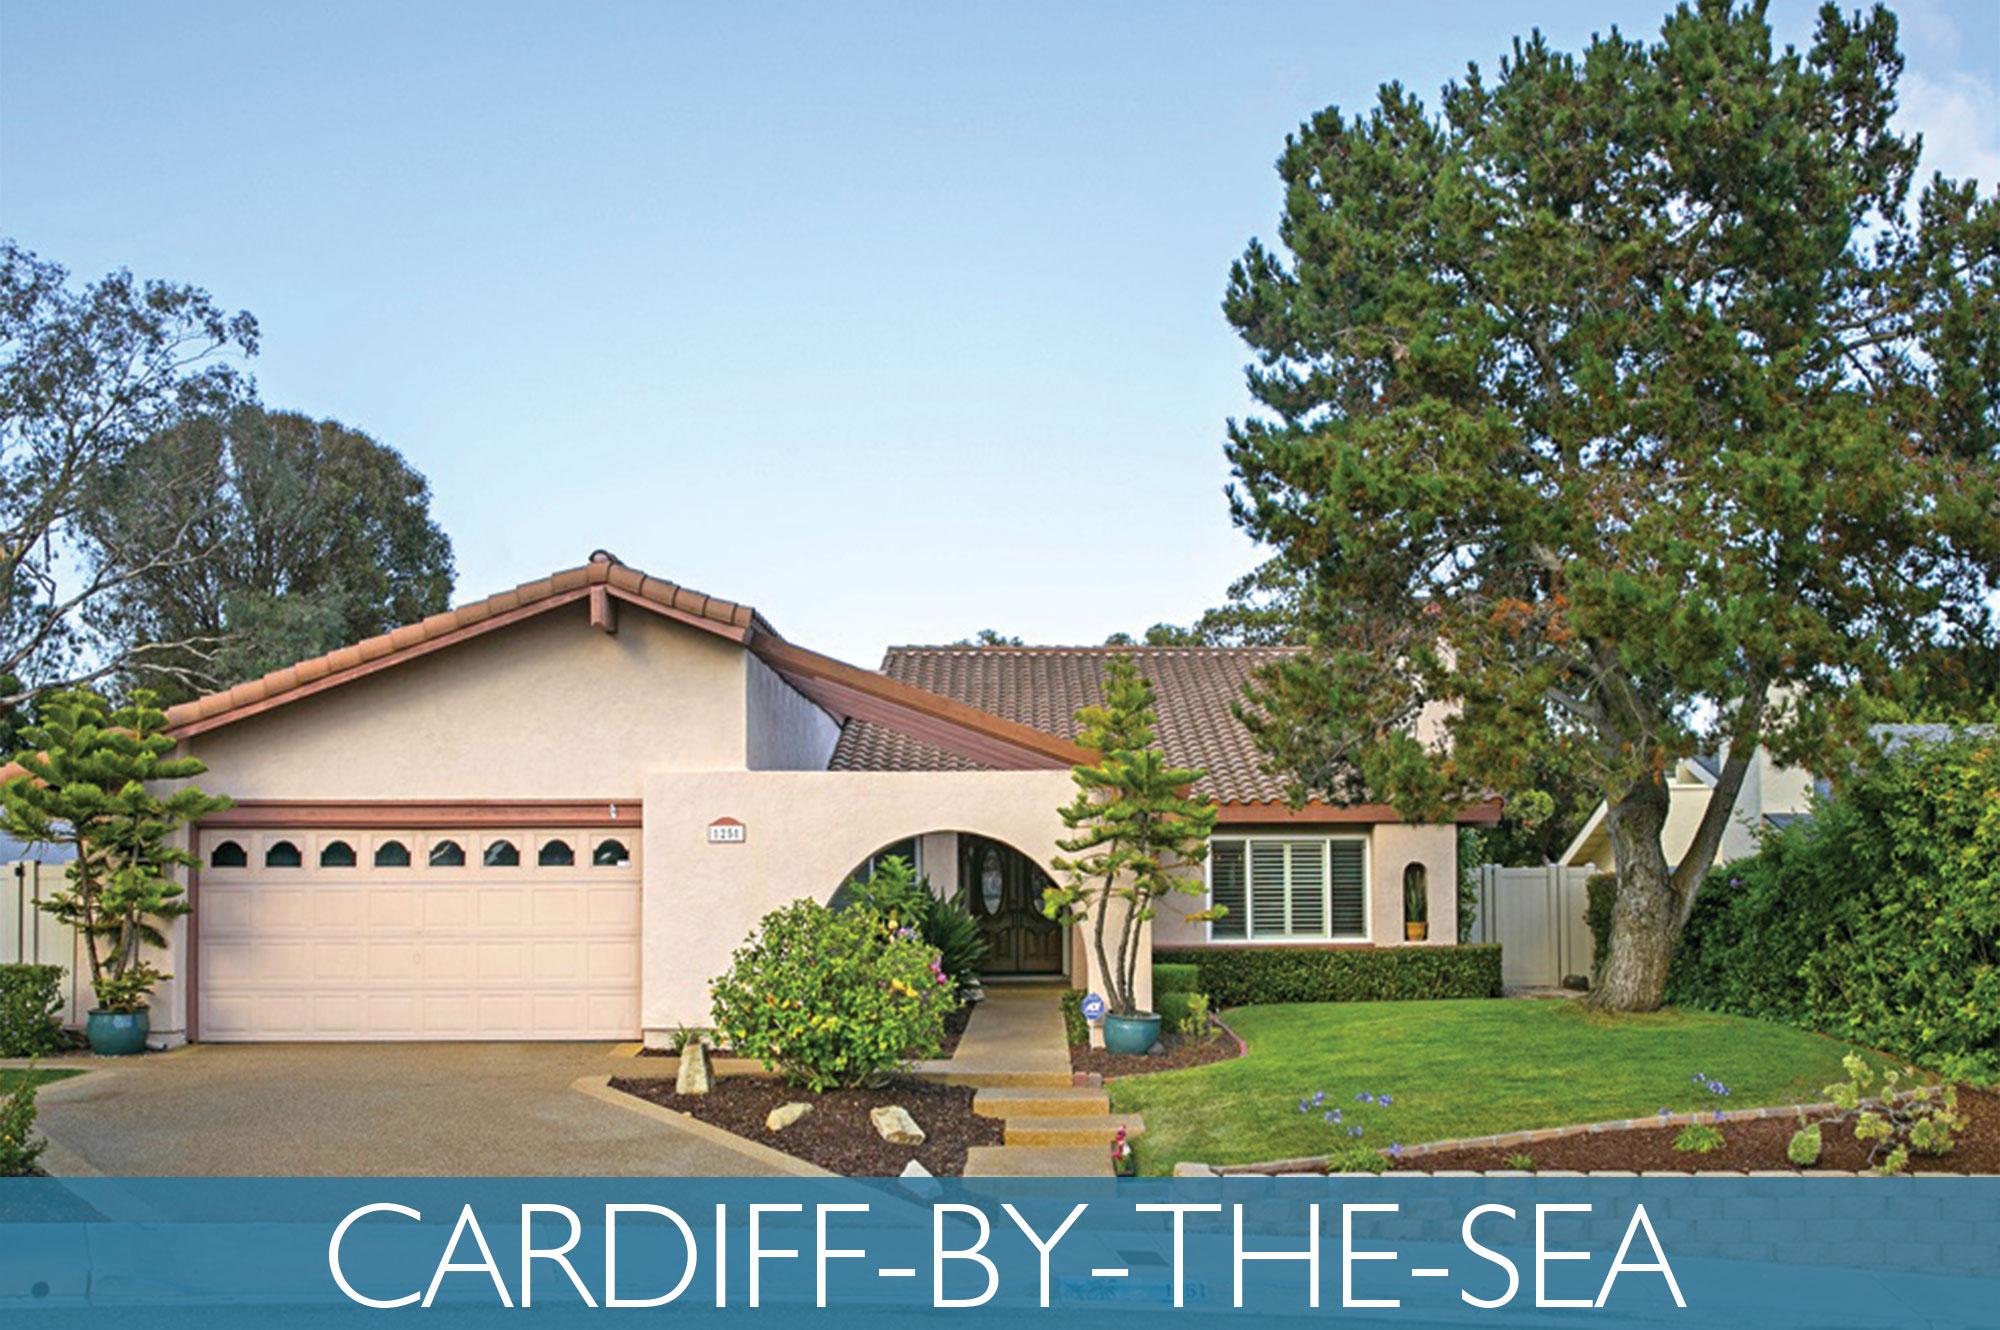 Cardiff By The Sea Coastal Premier Properties 858 755